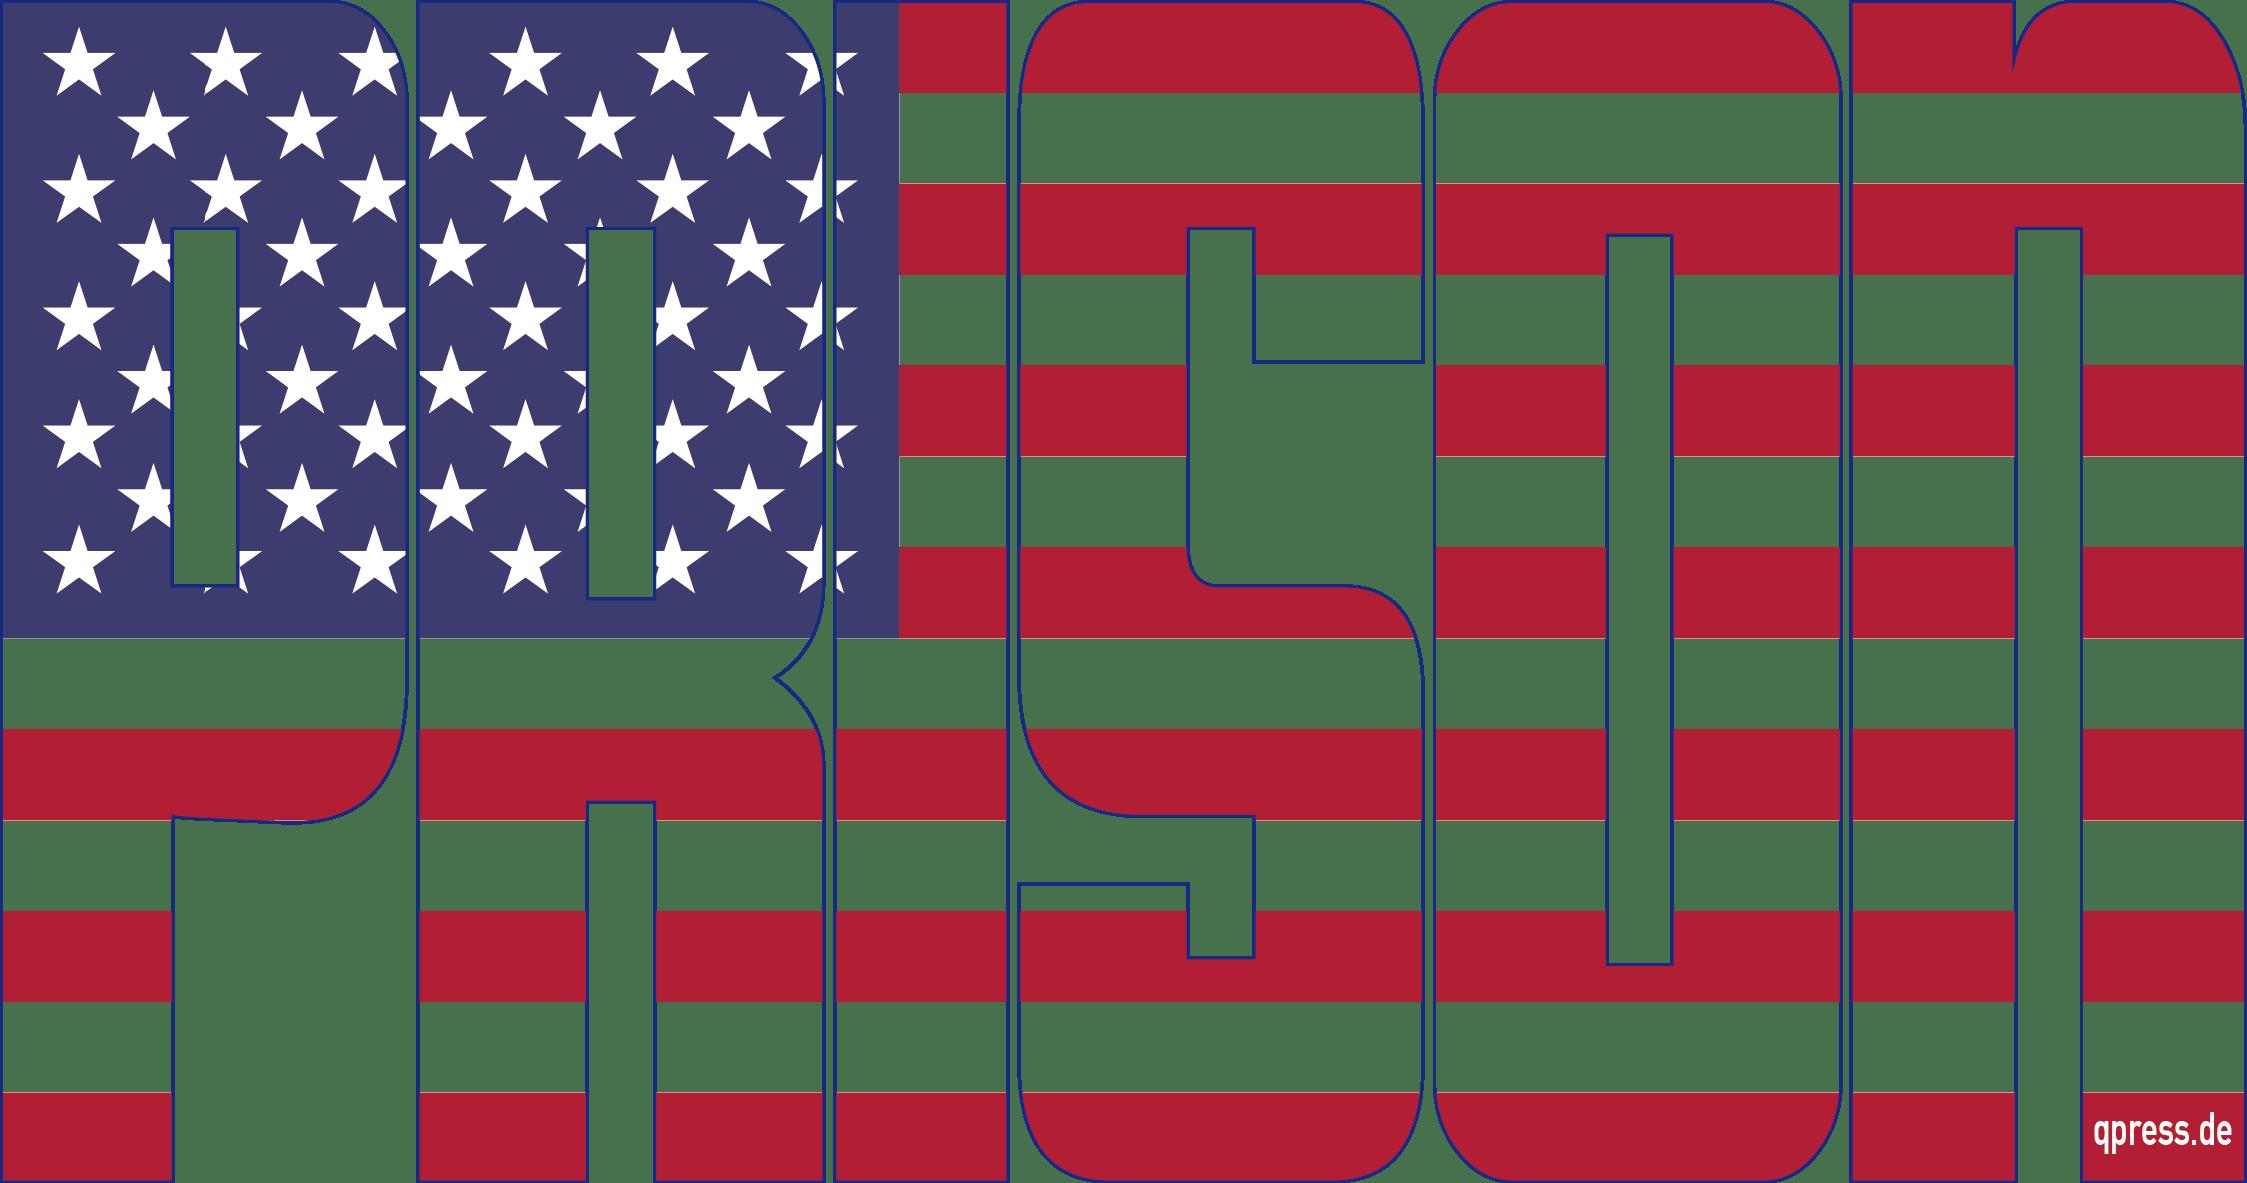 USA Prison Flag Gefaengnisstaat inmates